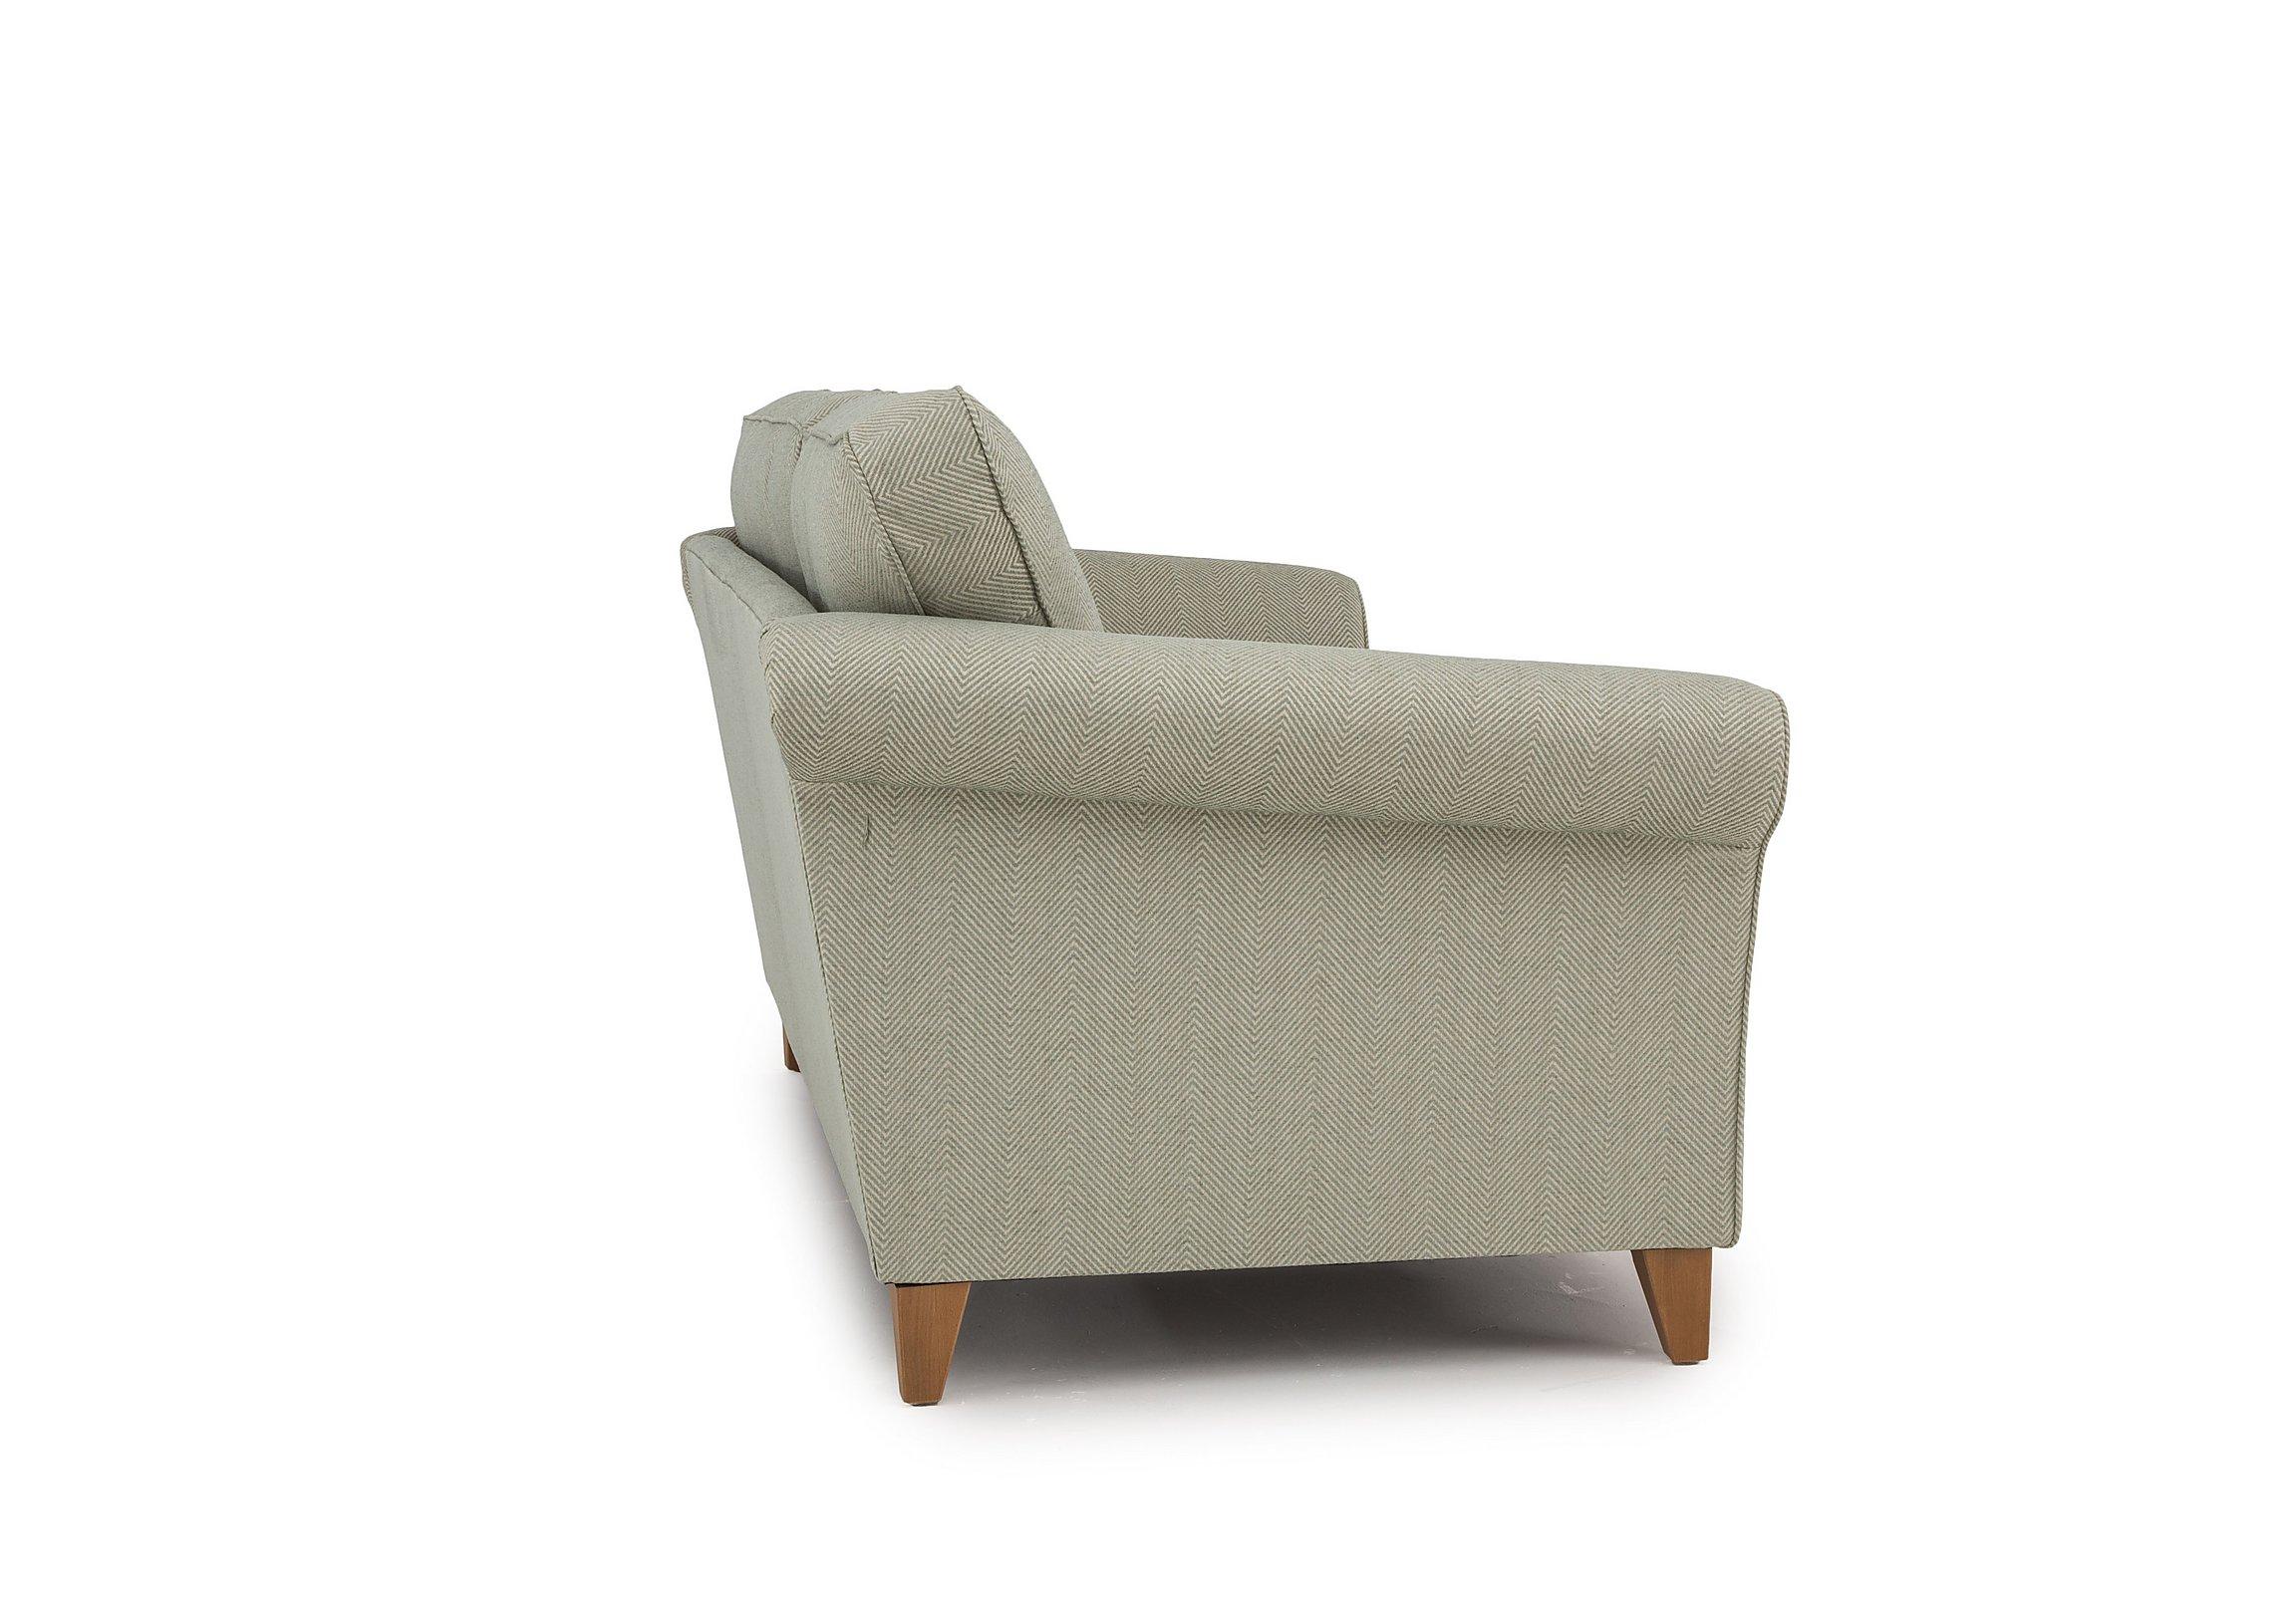 High Street Regent Street 3 Seater Fabric Sofa - Furniture Village